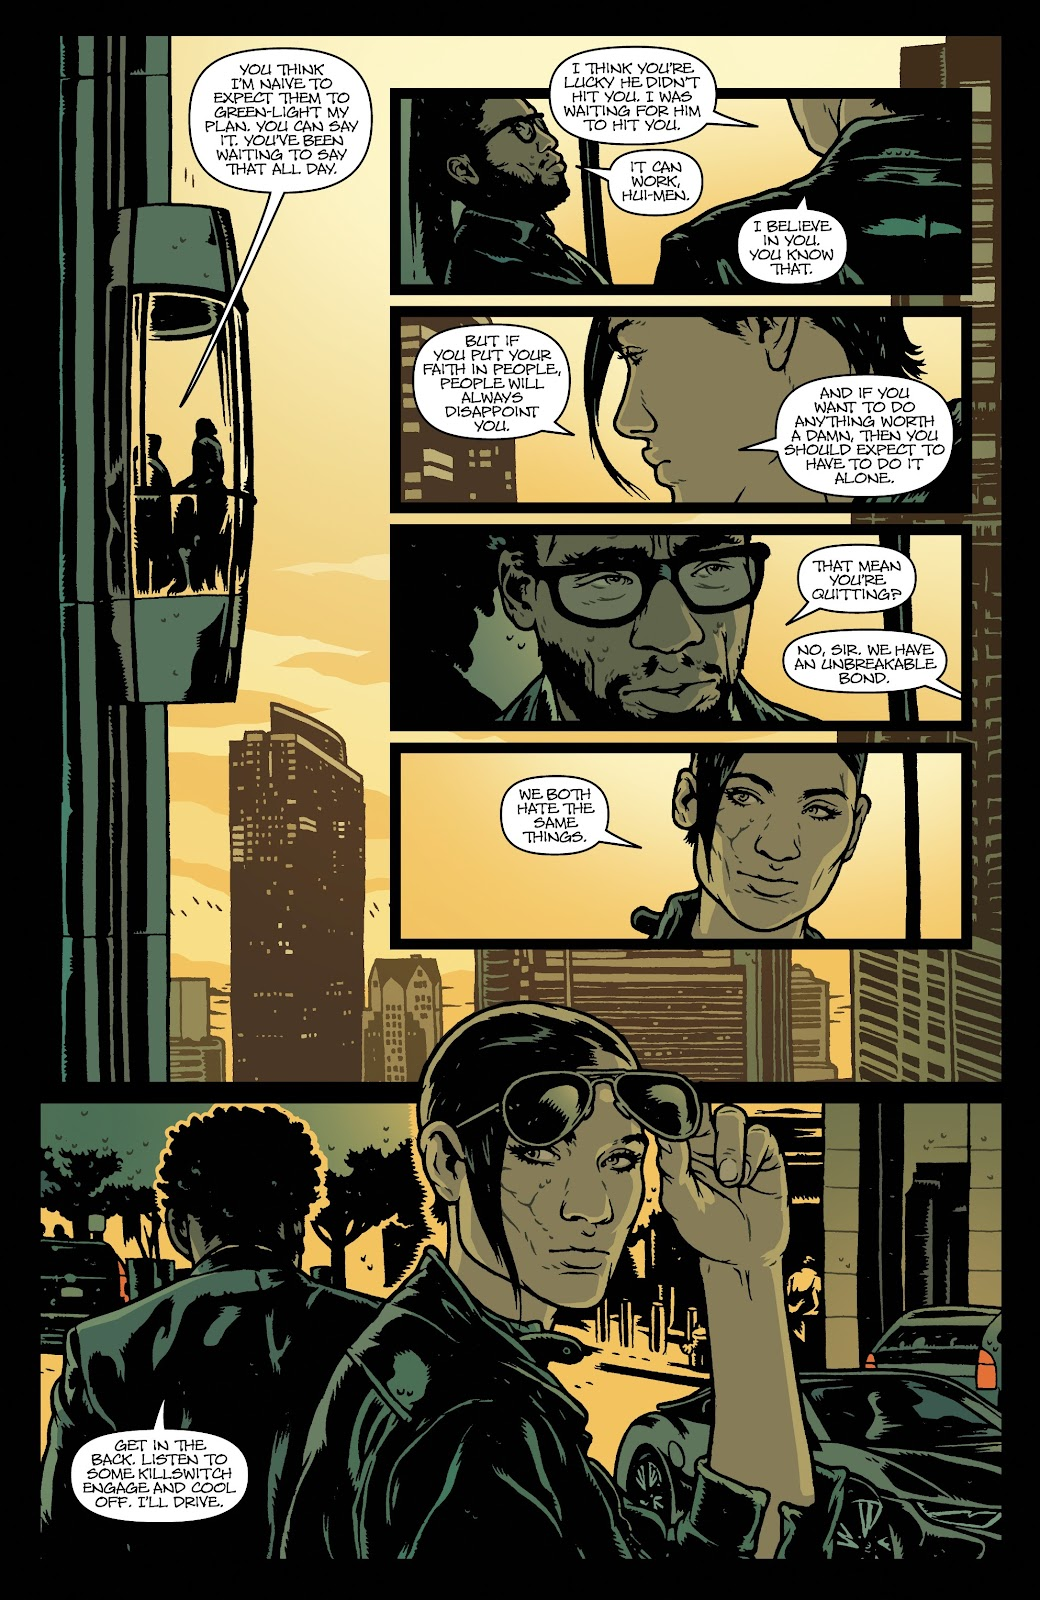 Read online Vindication comic -  Issue #1 - 30